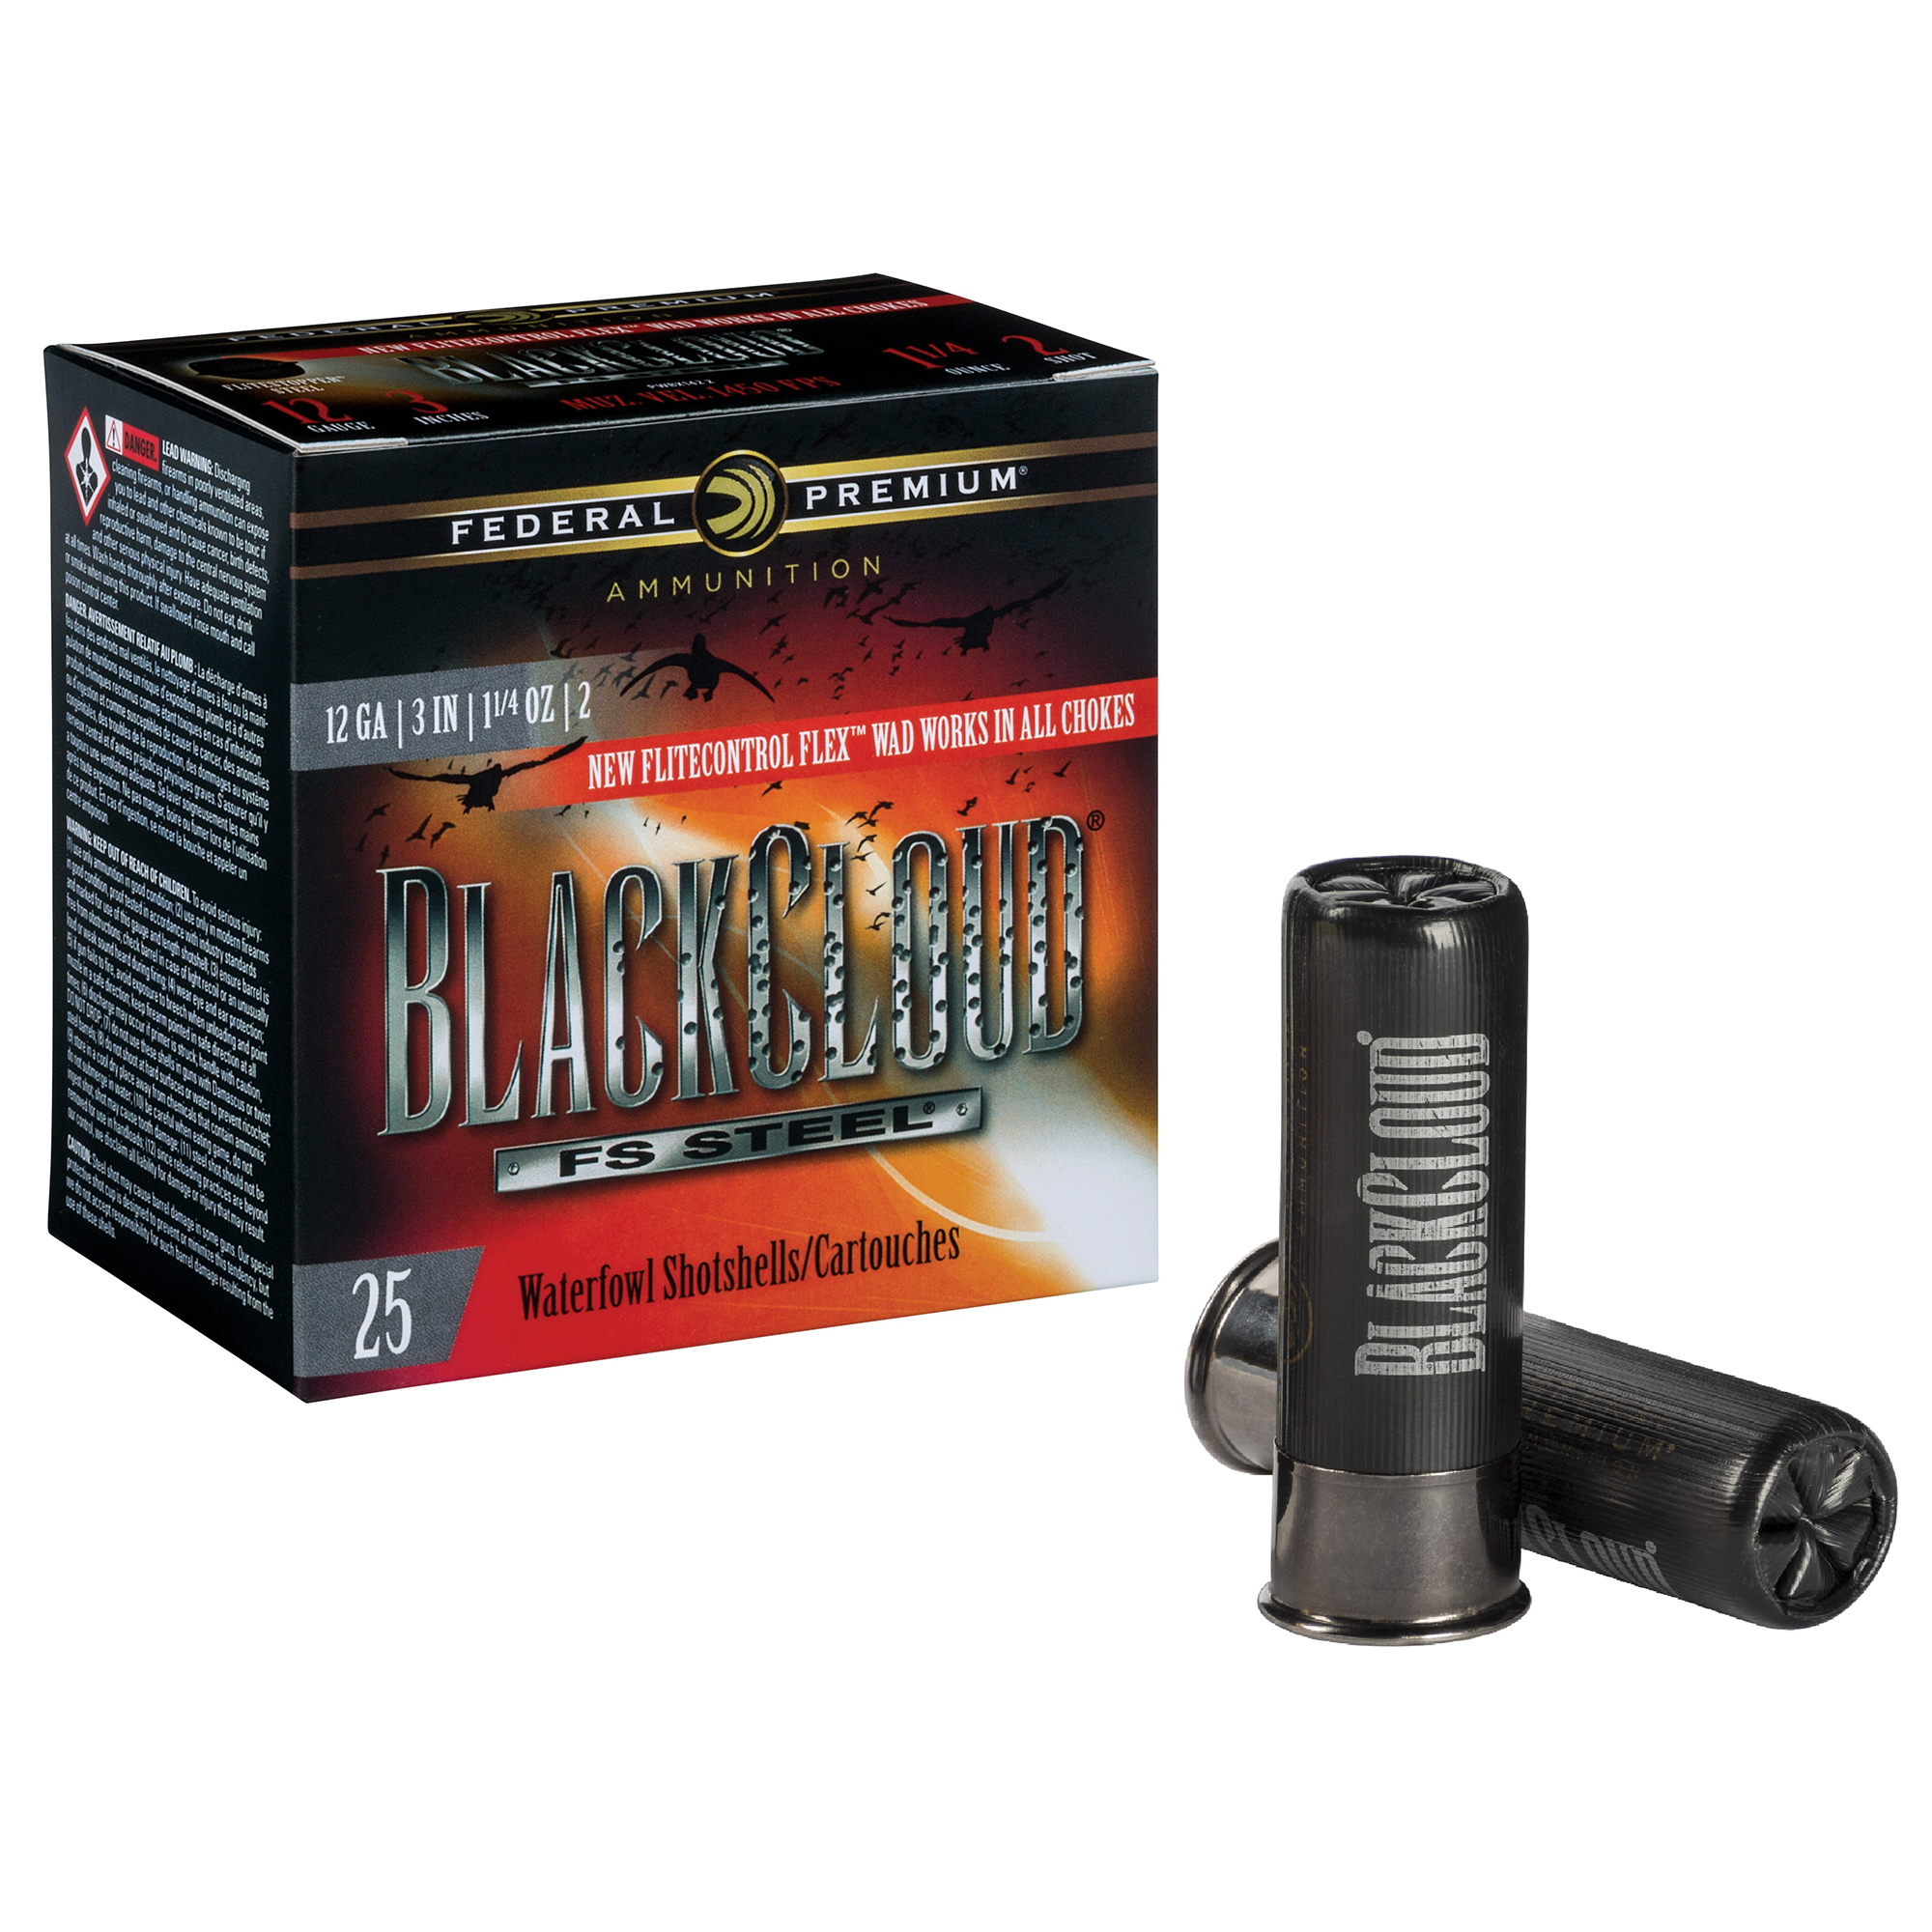 Federal Premium Black Cloud FS Steel Loads, 12-ga, 3″, 1-1/4 oz, #4